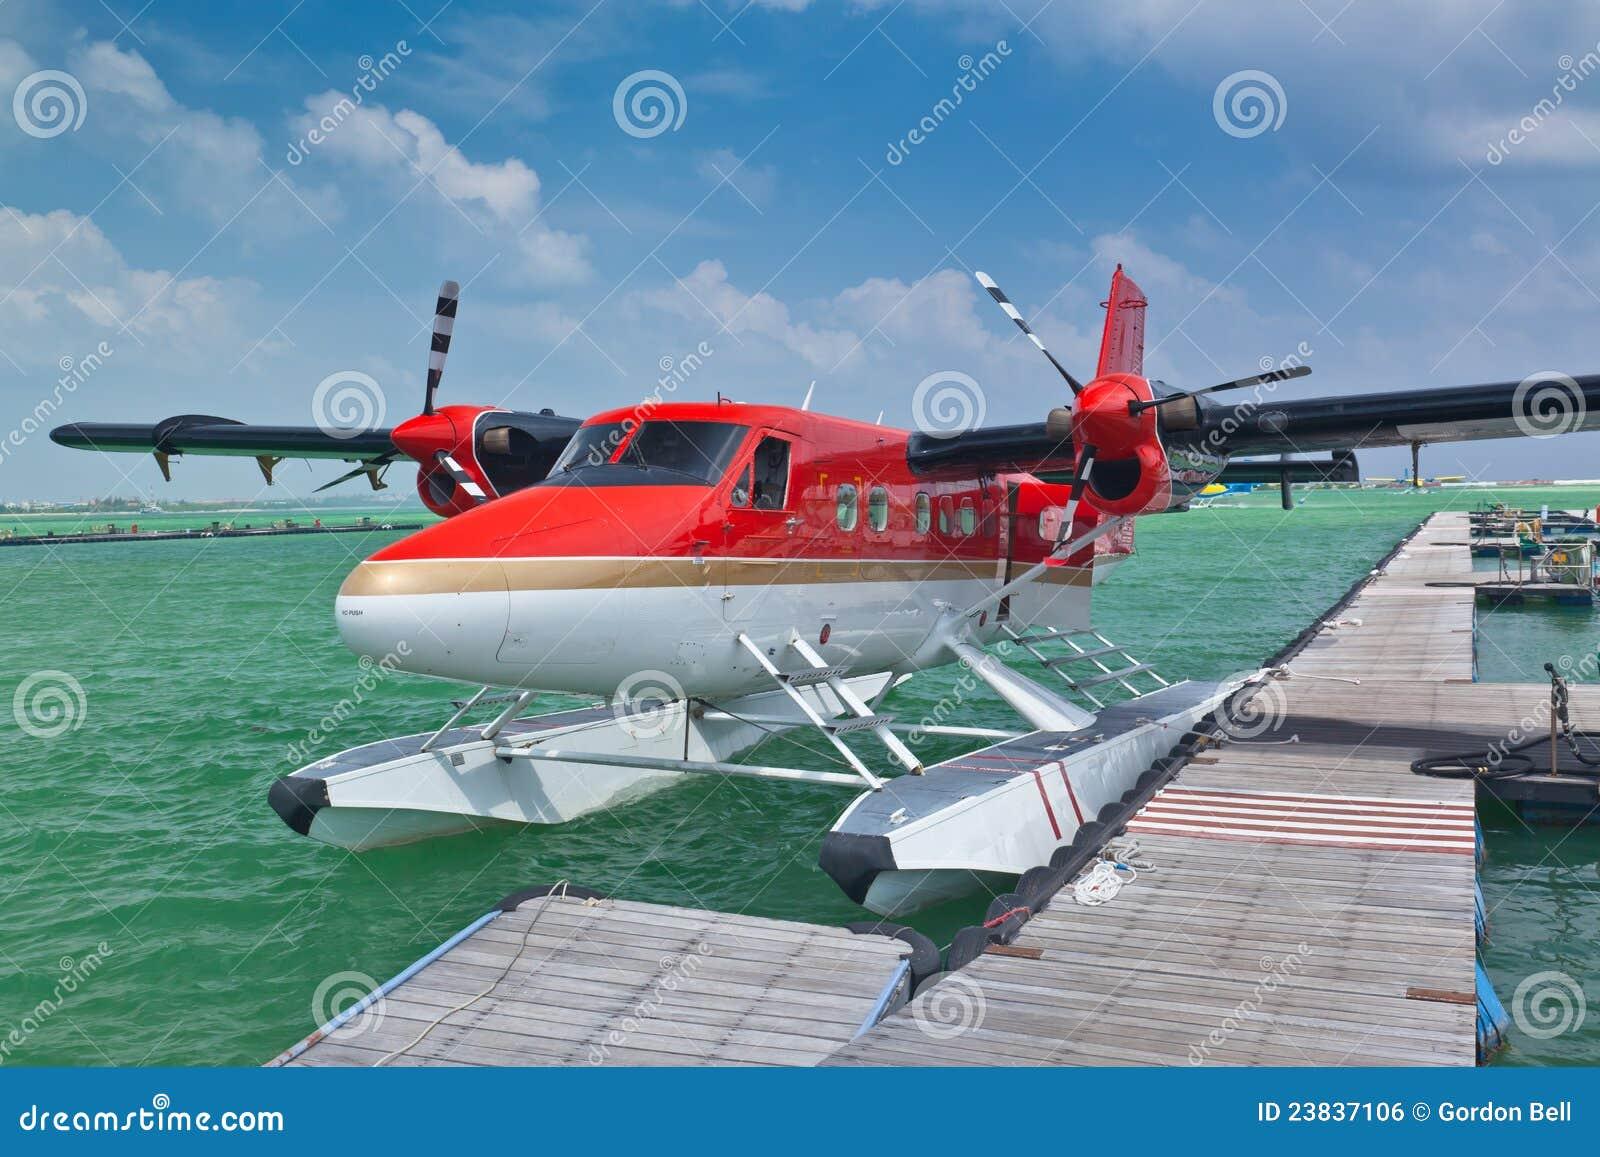 Air taxi business plan